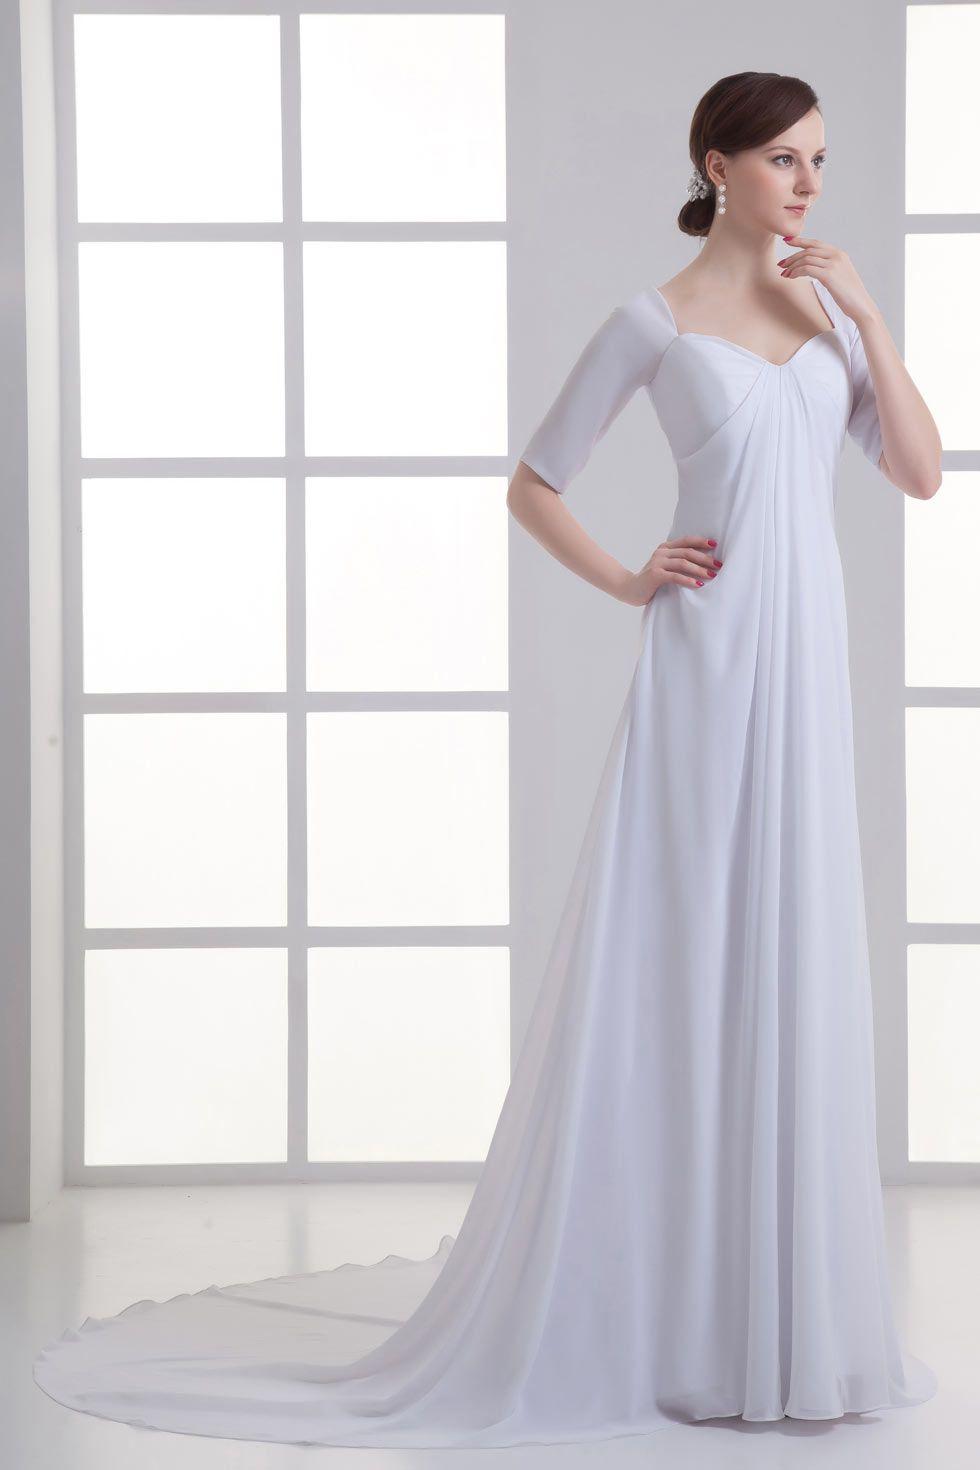 Chic half sleeves sweetheart court train chiffon wedding gown